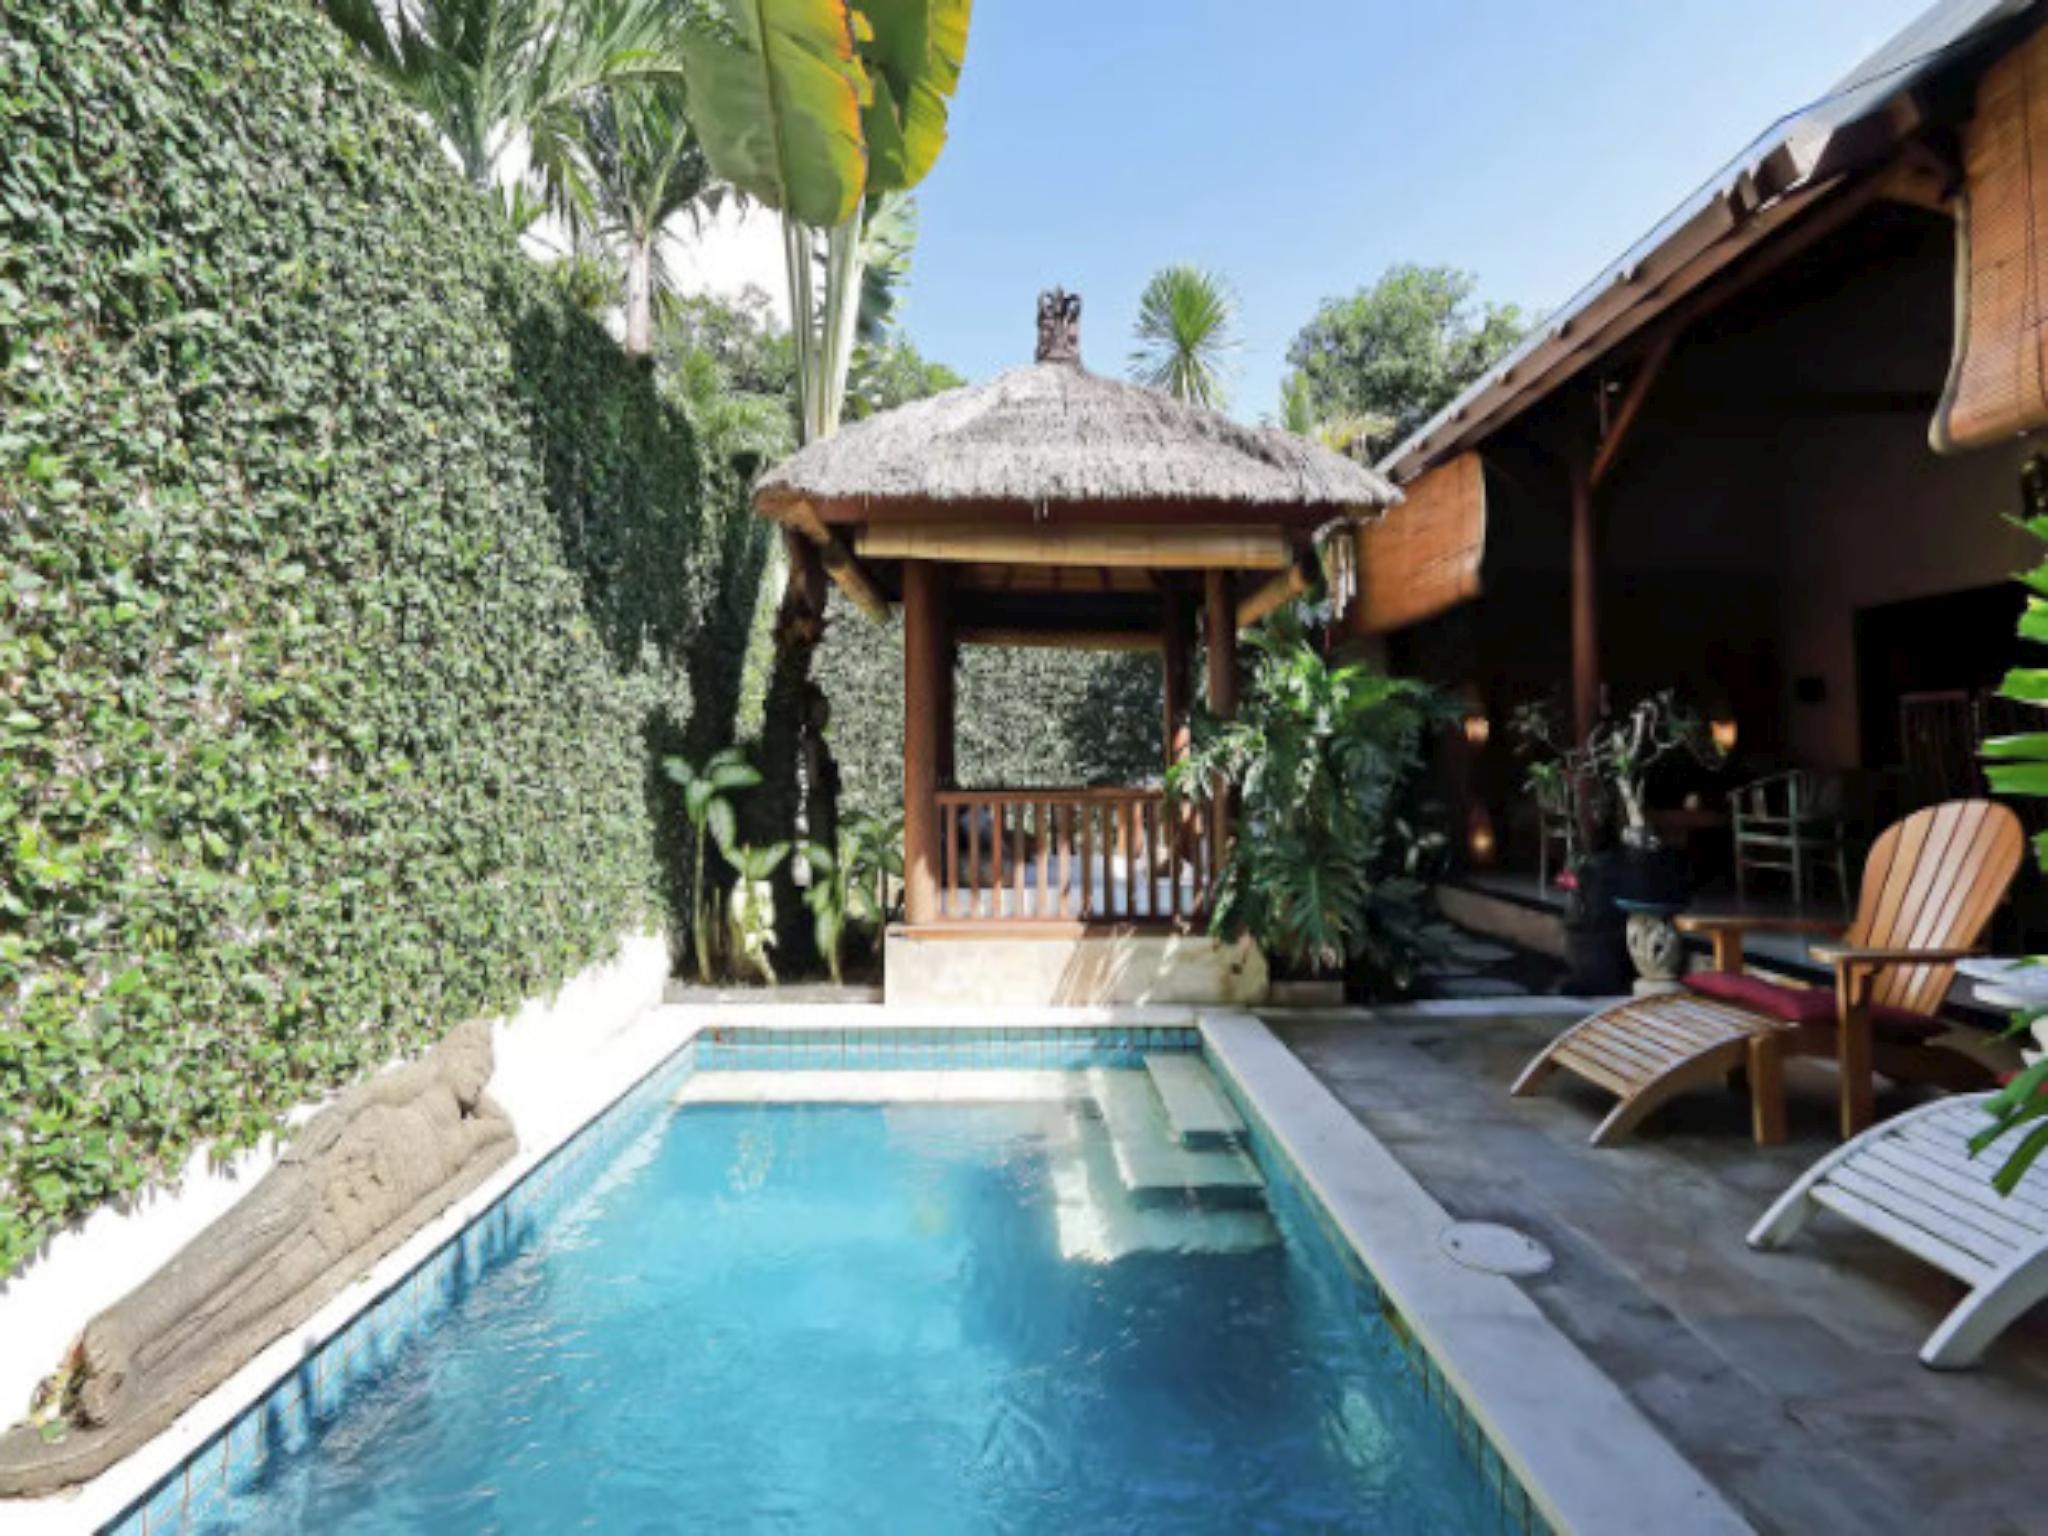 Villa Belharra 2 Bedrooms ホテル詳細